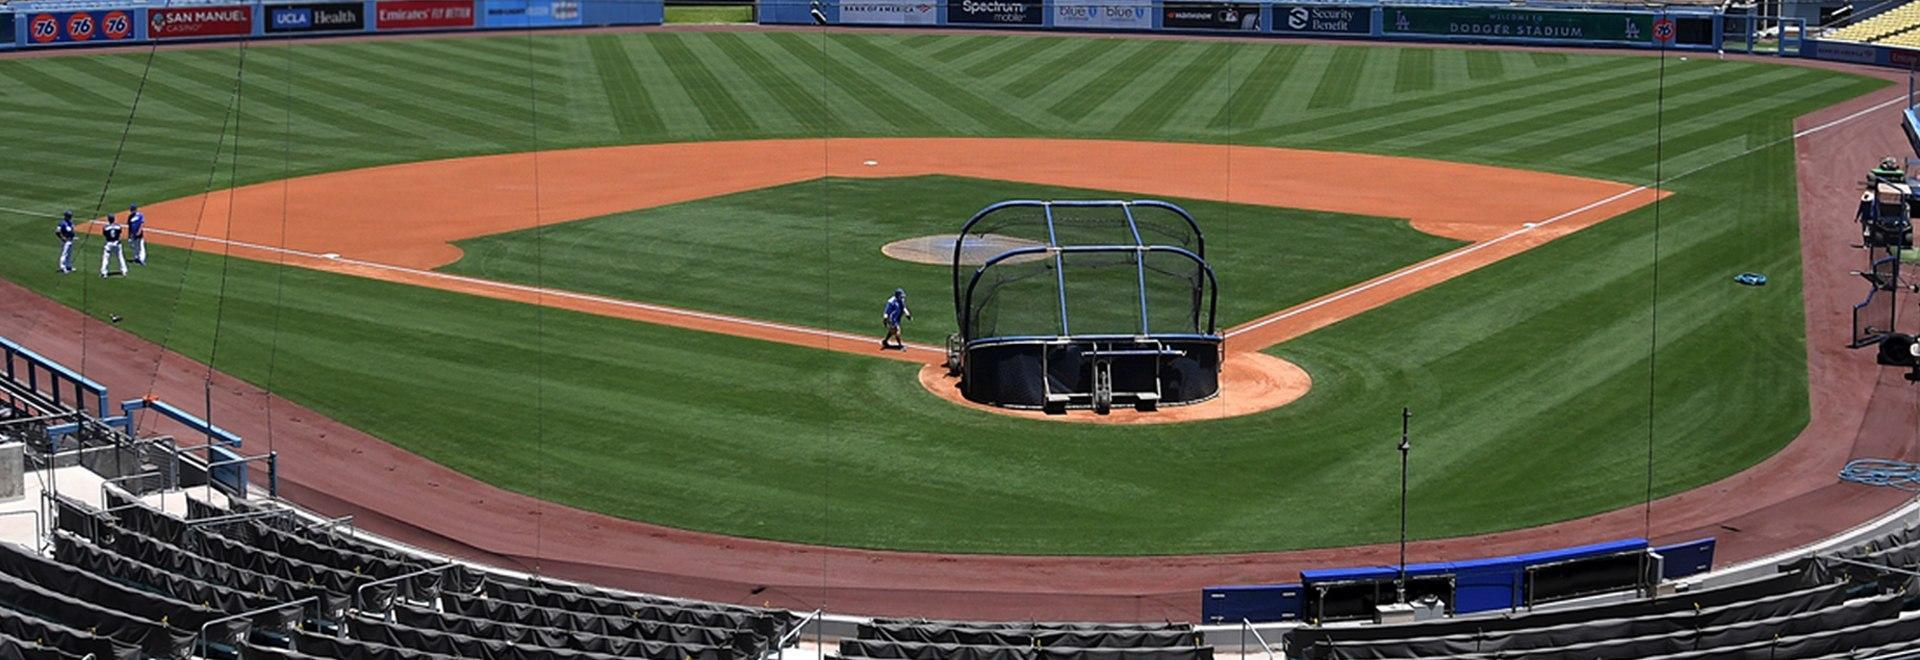 Washington - NY Yankees